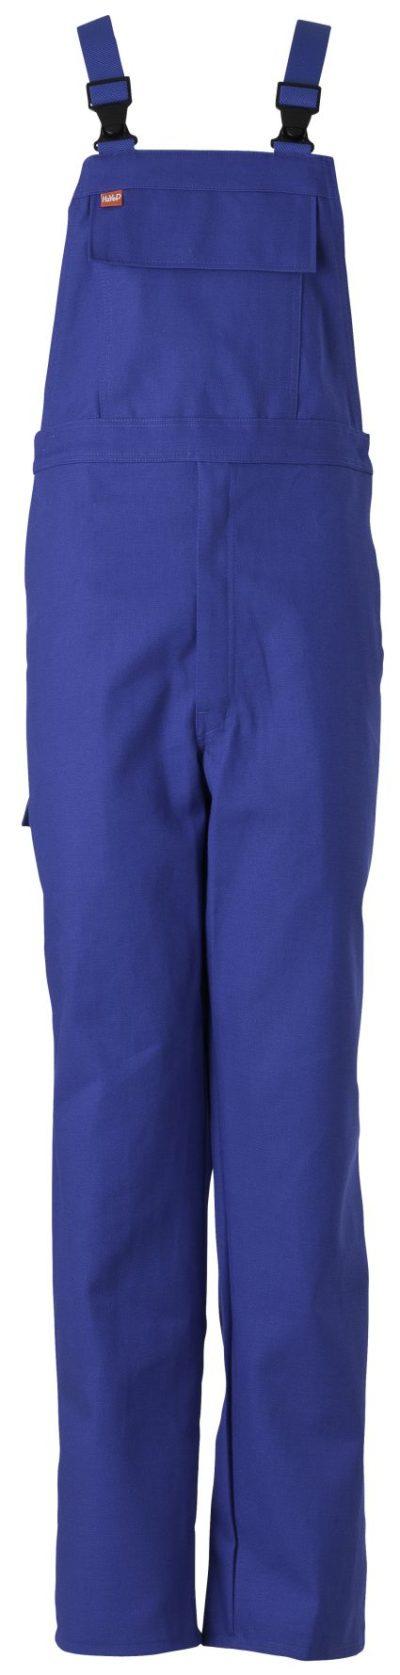 HaVeP Workwear/Protective wear Amerikaanse overall/Bretelbroek 2560